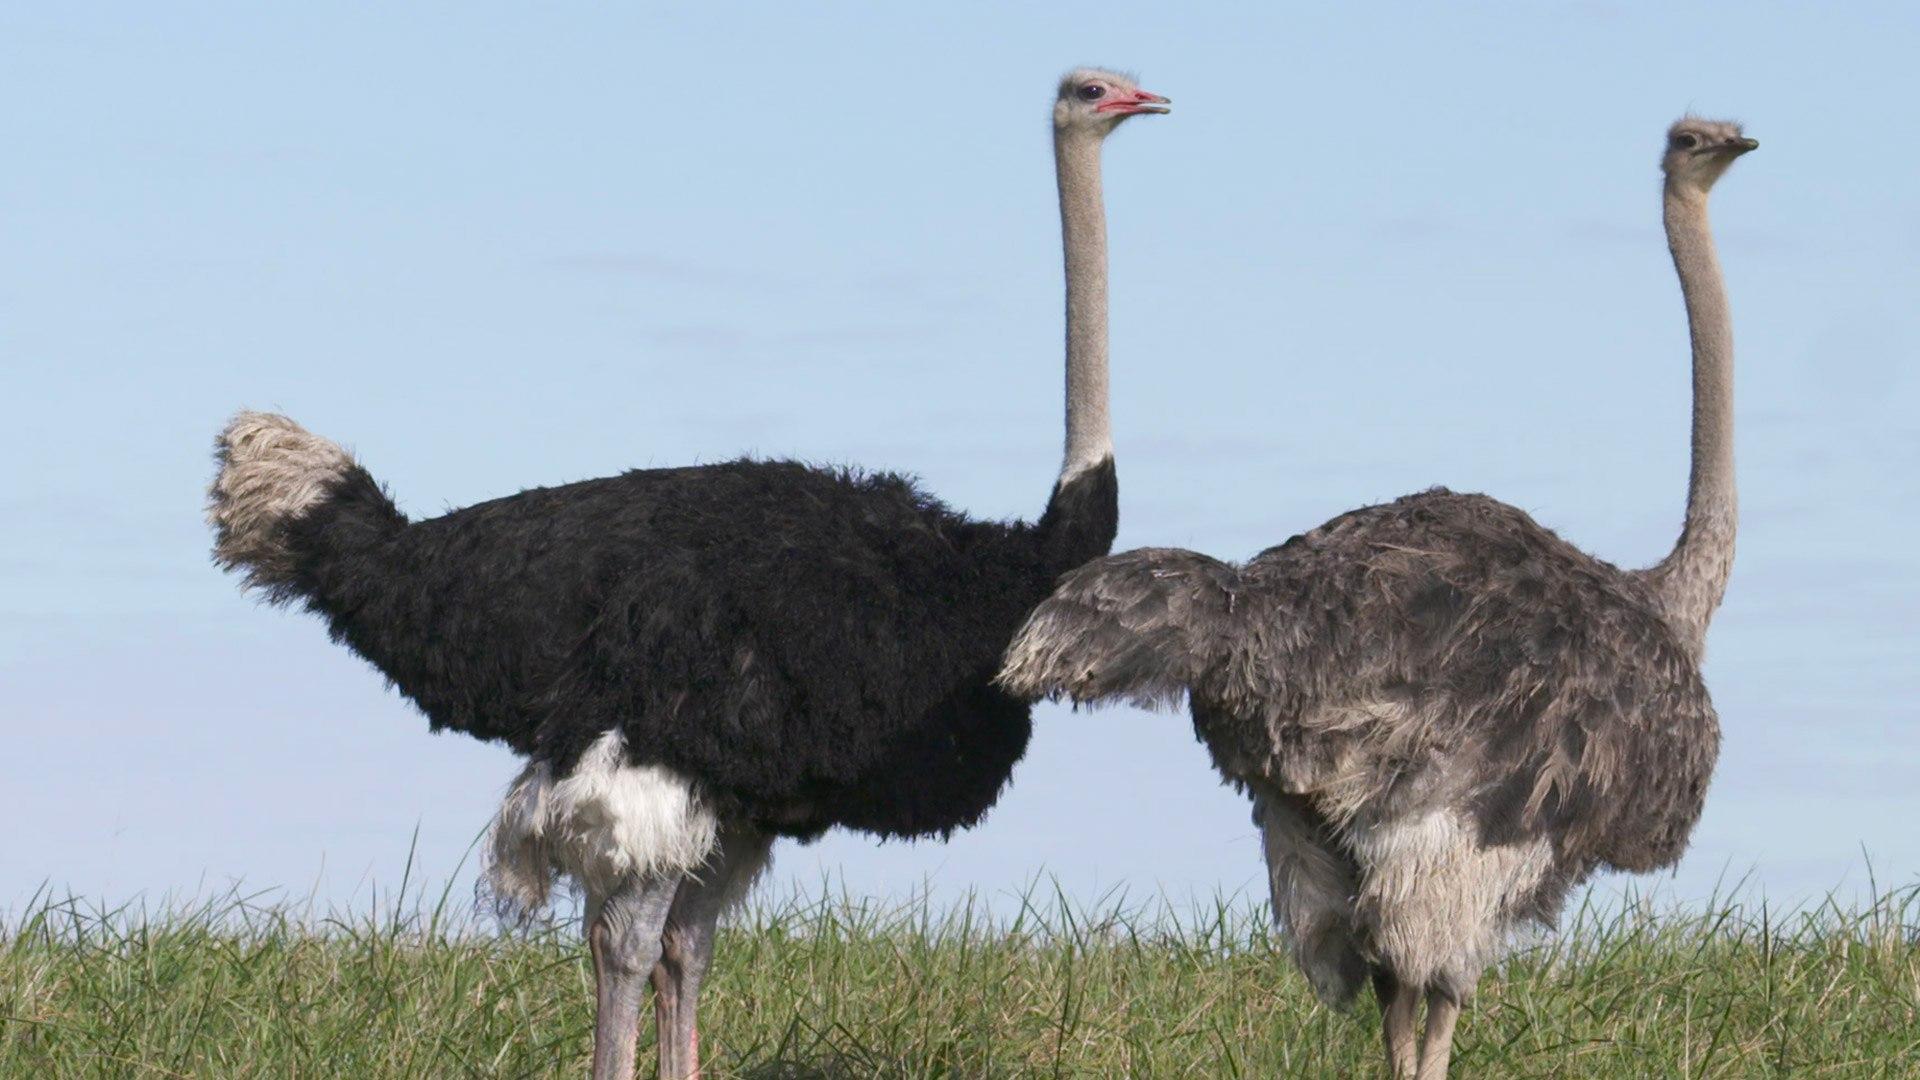 NatGeo Wild HD L'oasi degli animali: casi esotici